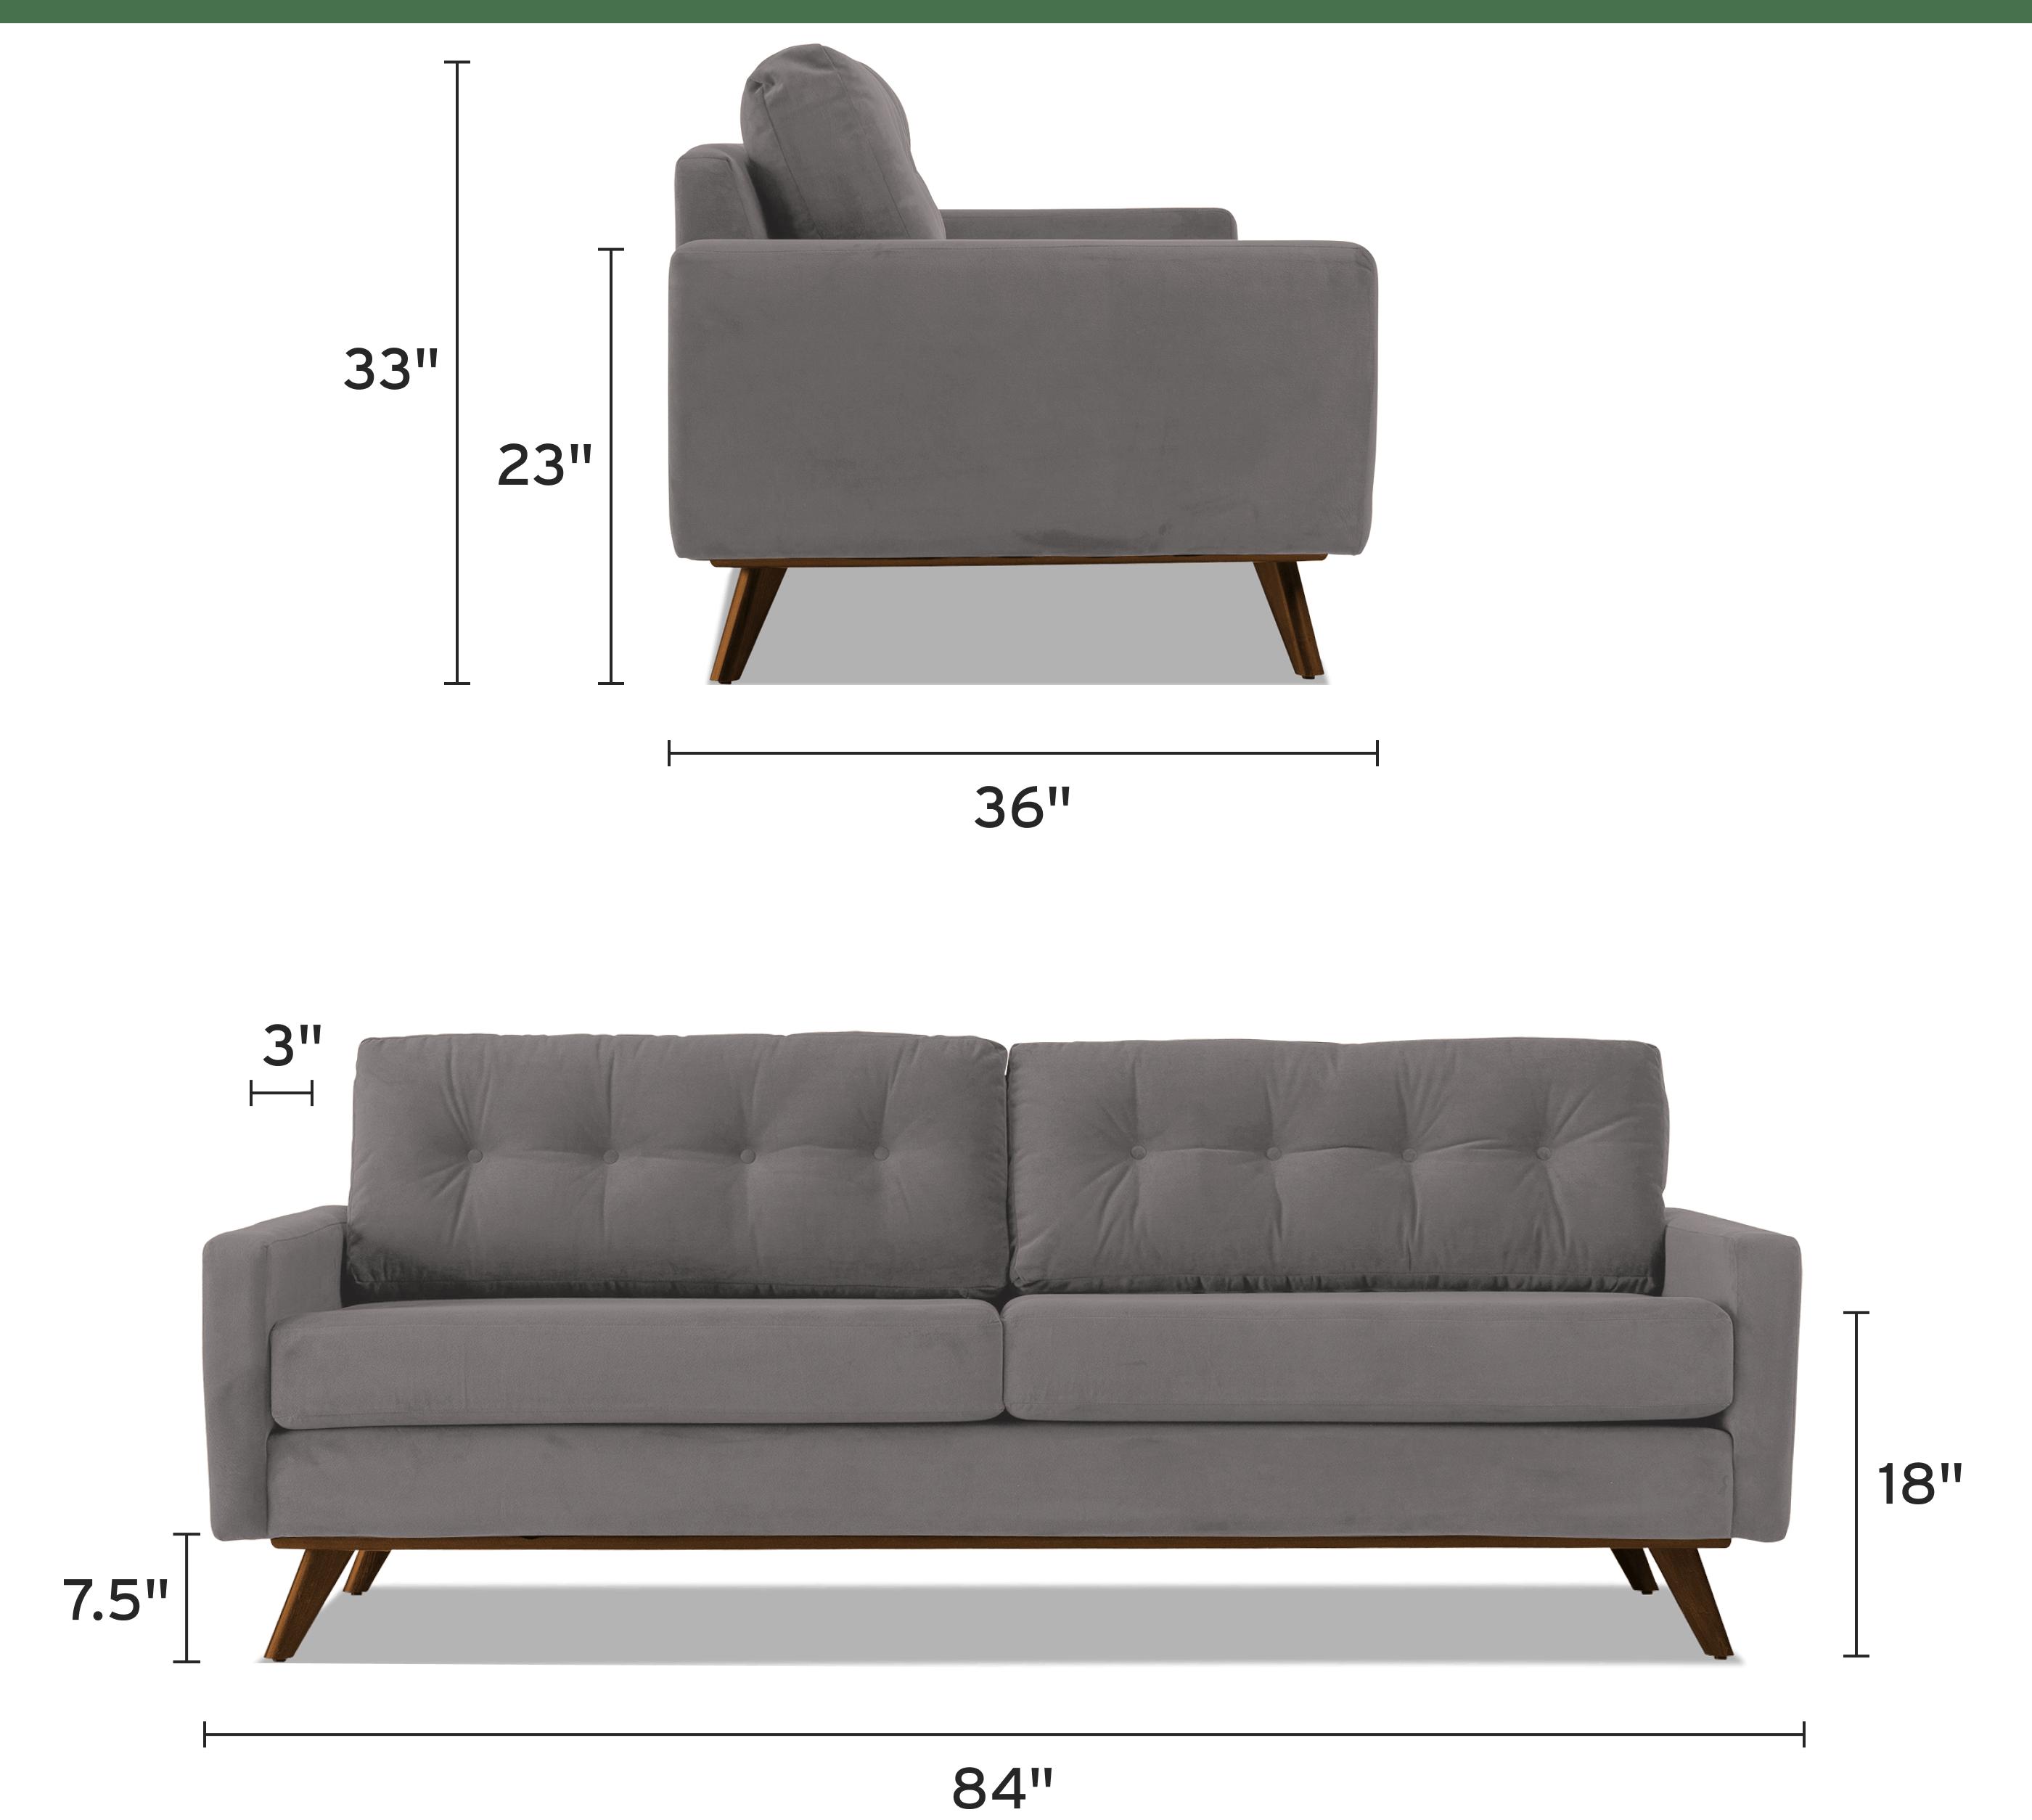 hopson sofa mobile dimensional image